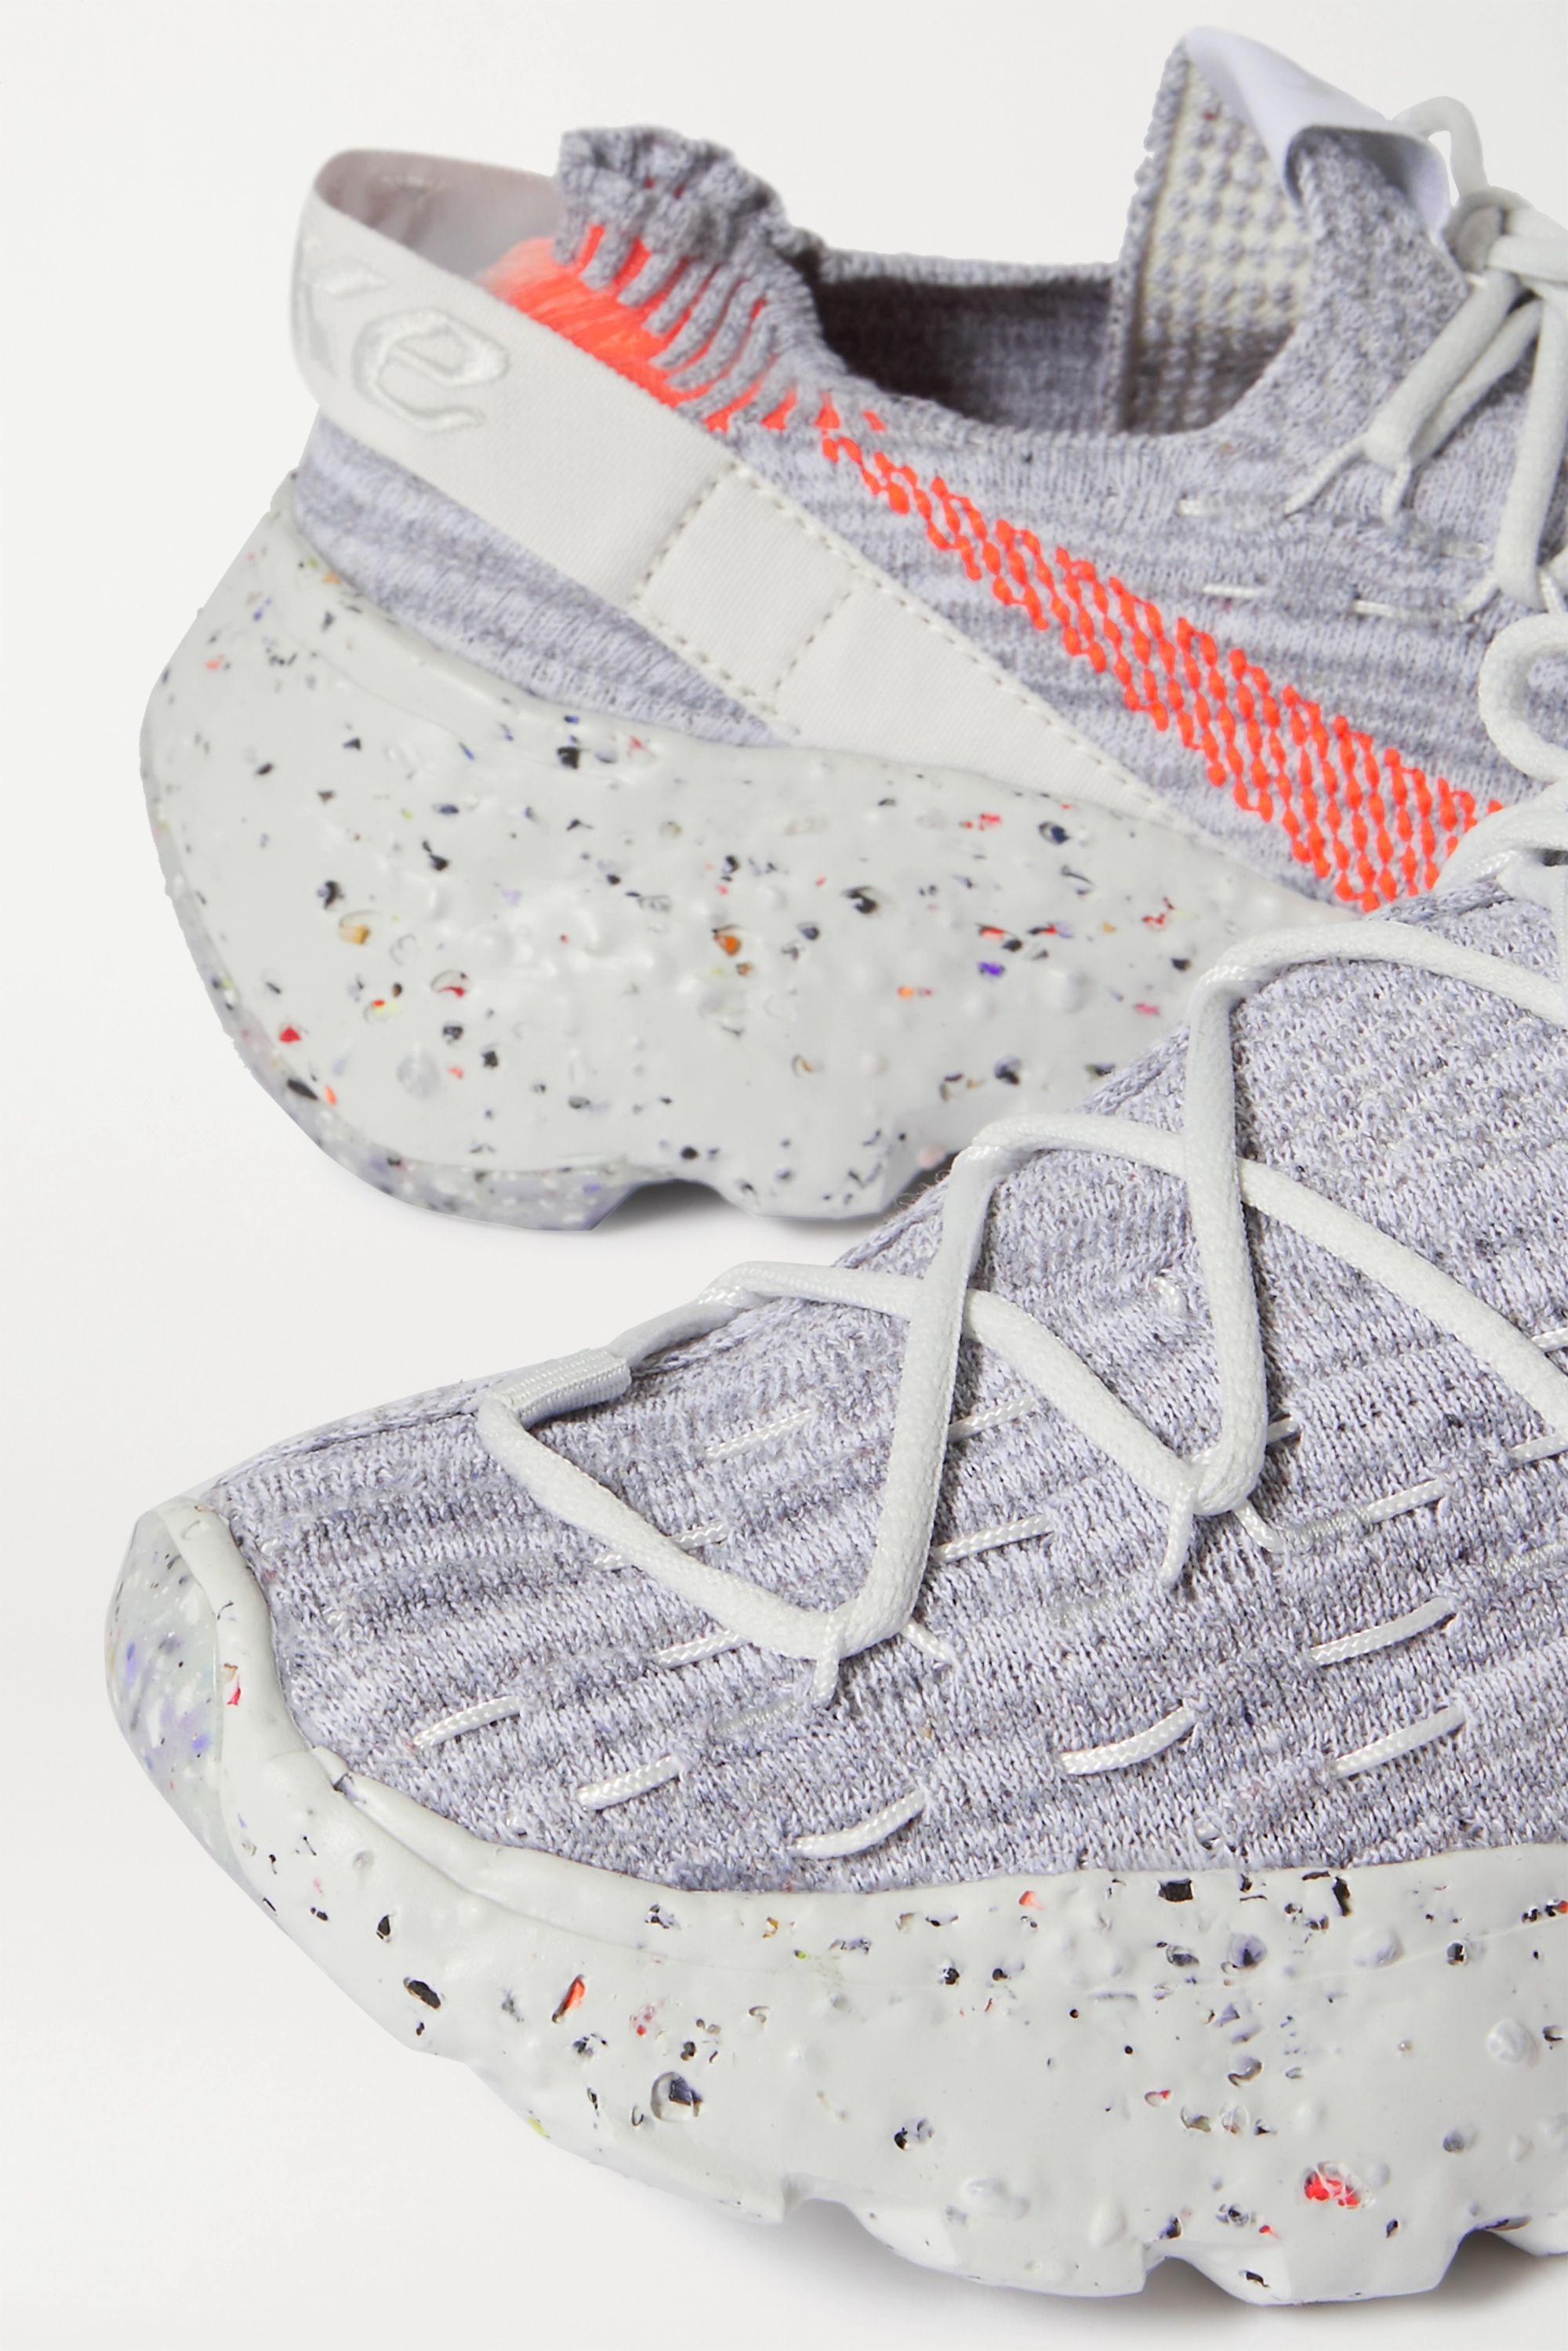 Nike Space Hippie 04 Space Waste sneakers